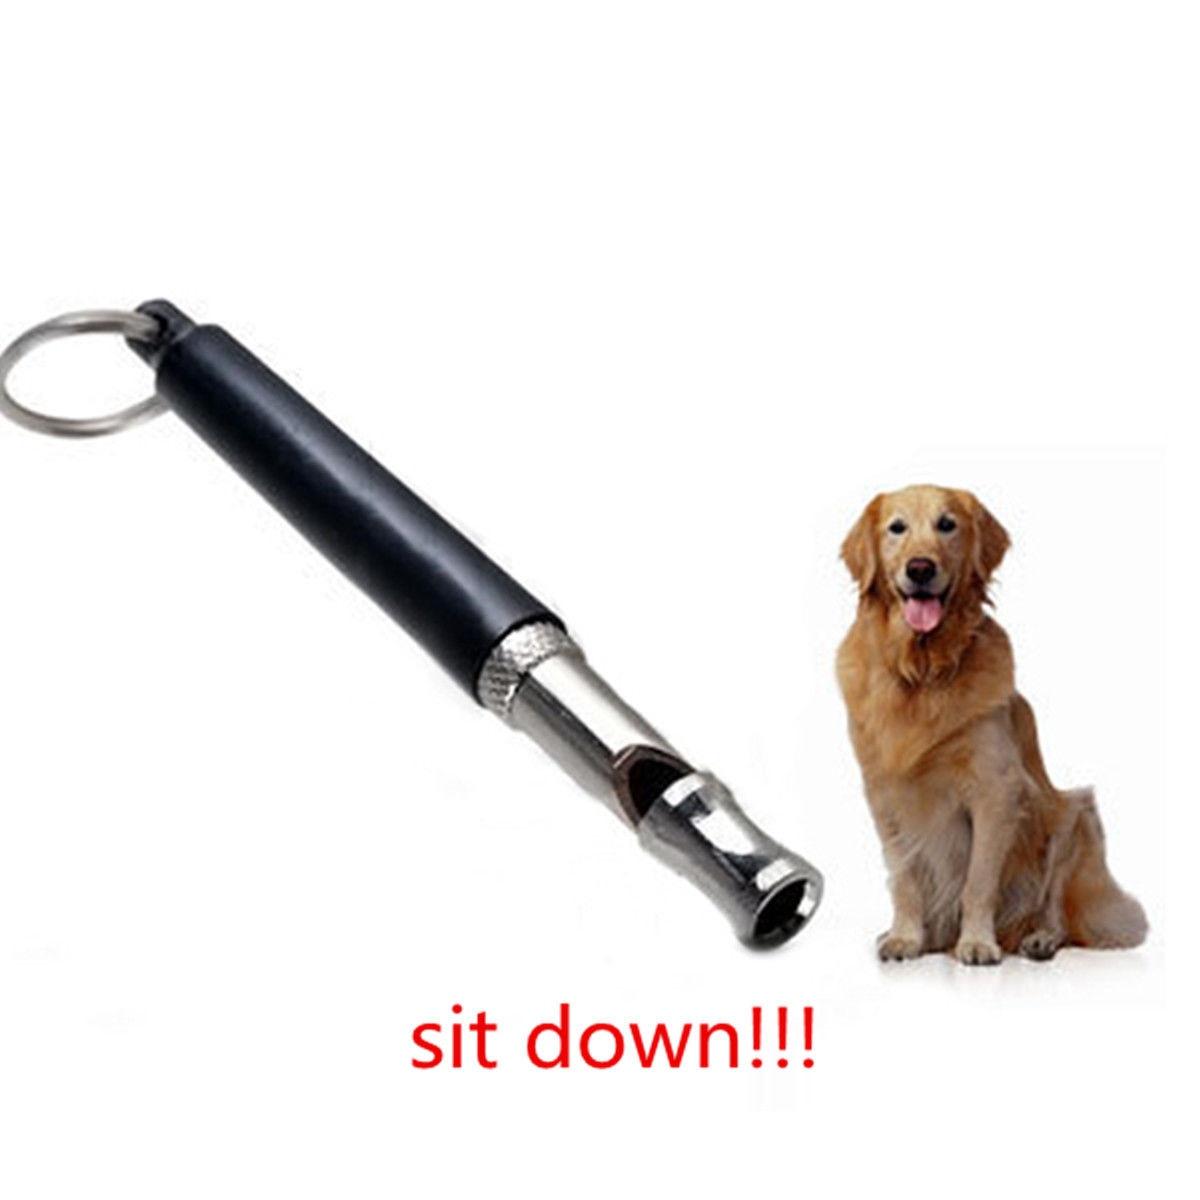 UltraSonic Pet Dog Training Whistle Sonido Ajustable Silencioso - Productos animales - foto 2